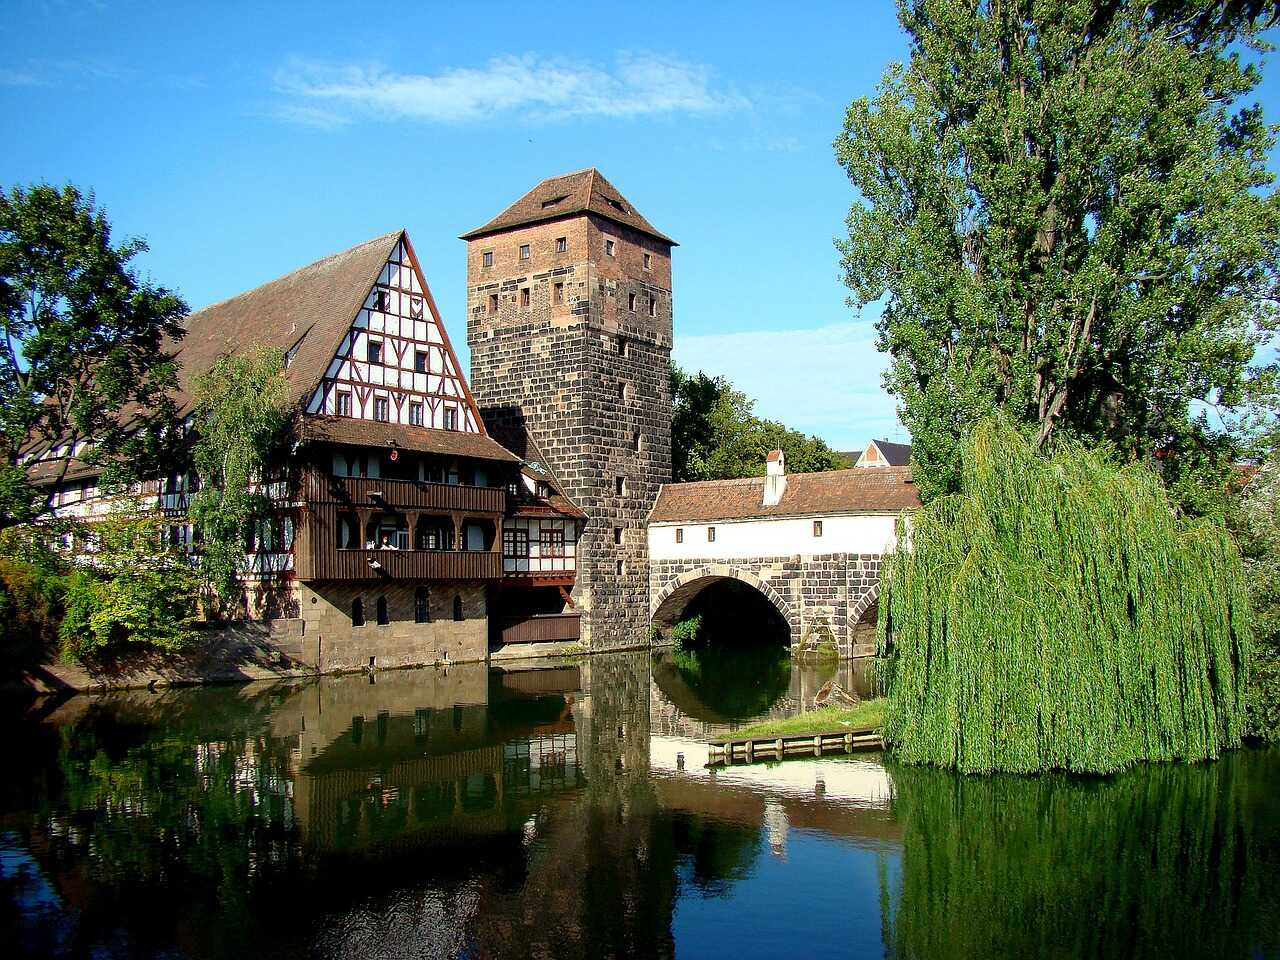 Nuremberg vieille ville historique